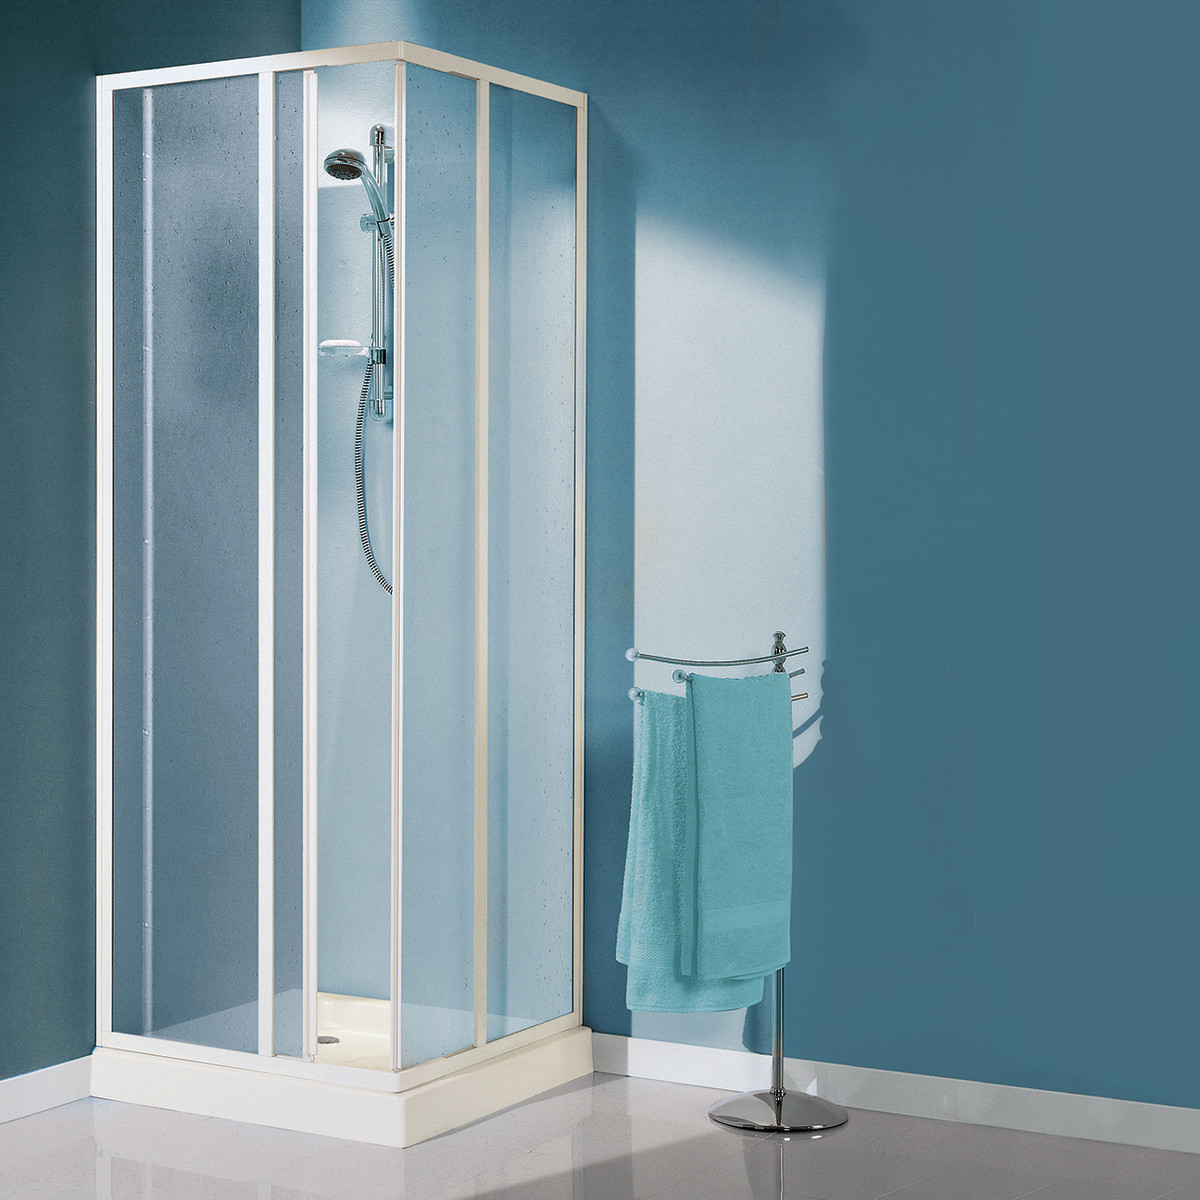 Leroy merlin bagno box doccia leroy merlin vasche bagno - Vasche da bagno leroy merlin ...